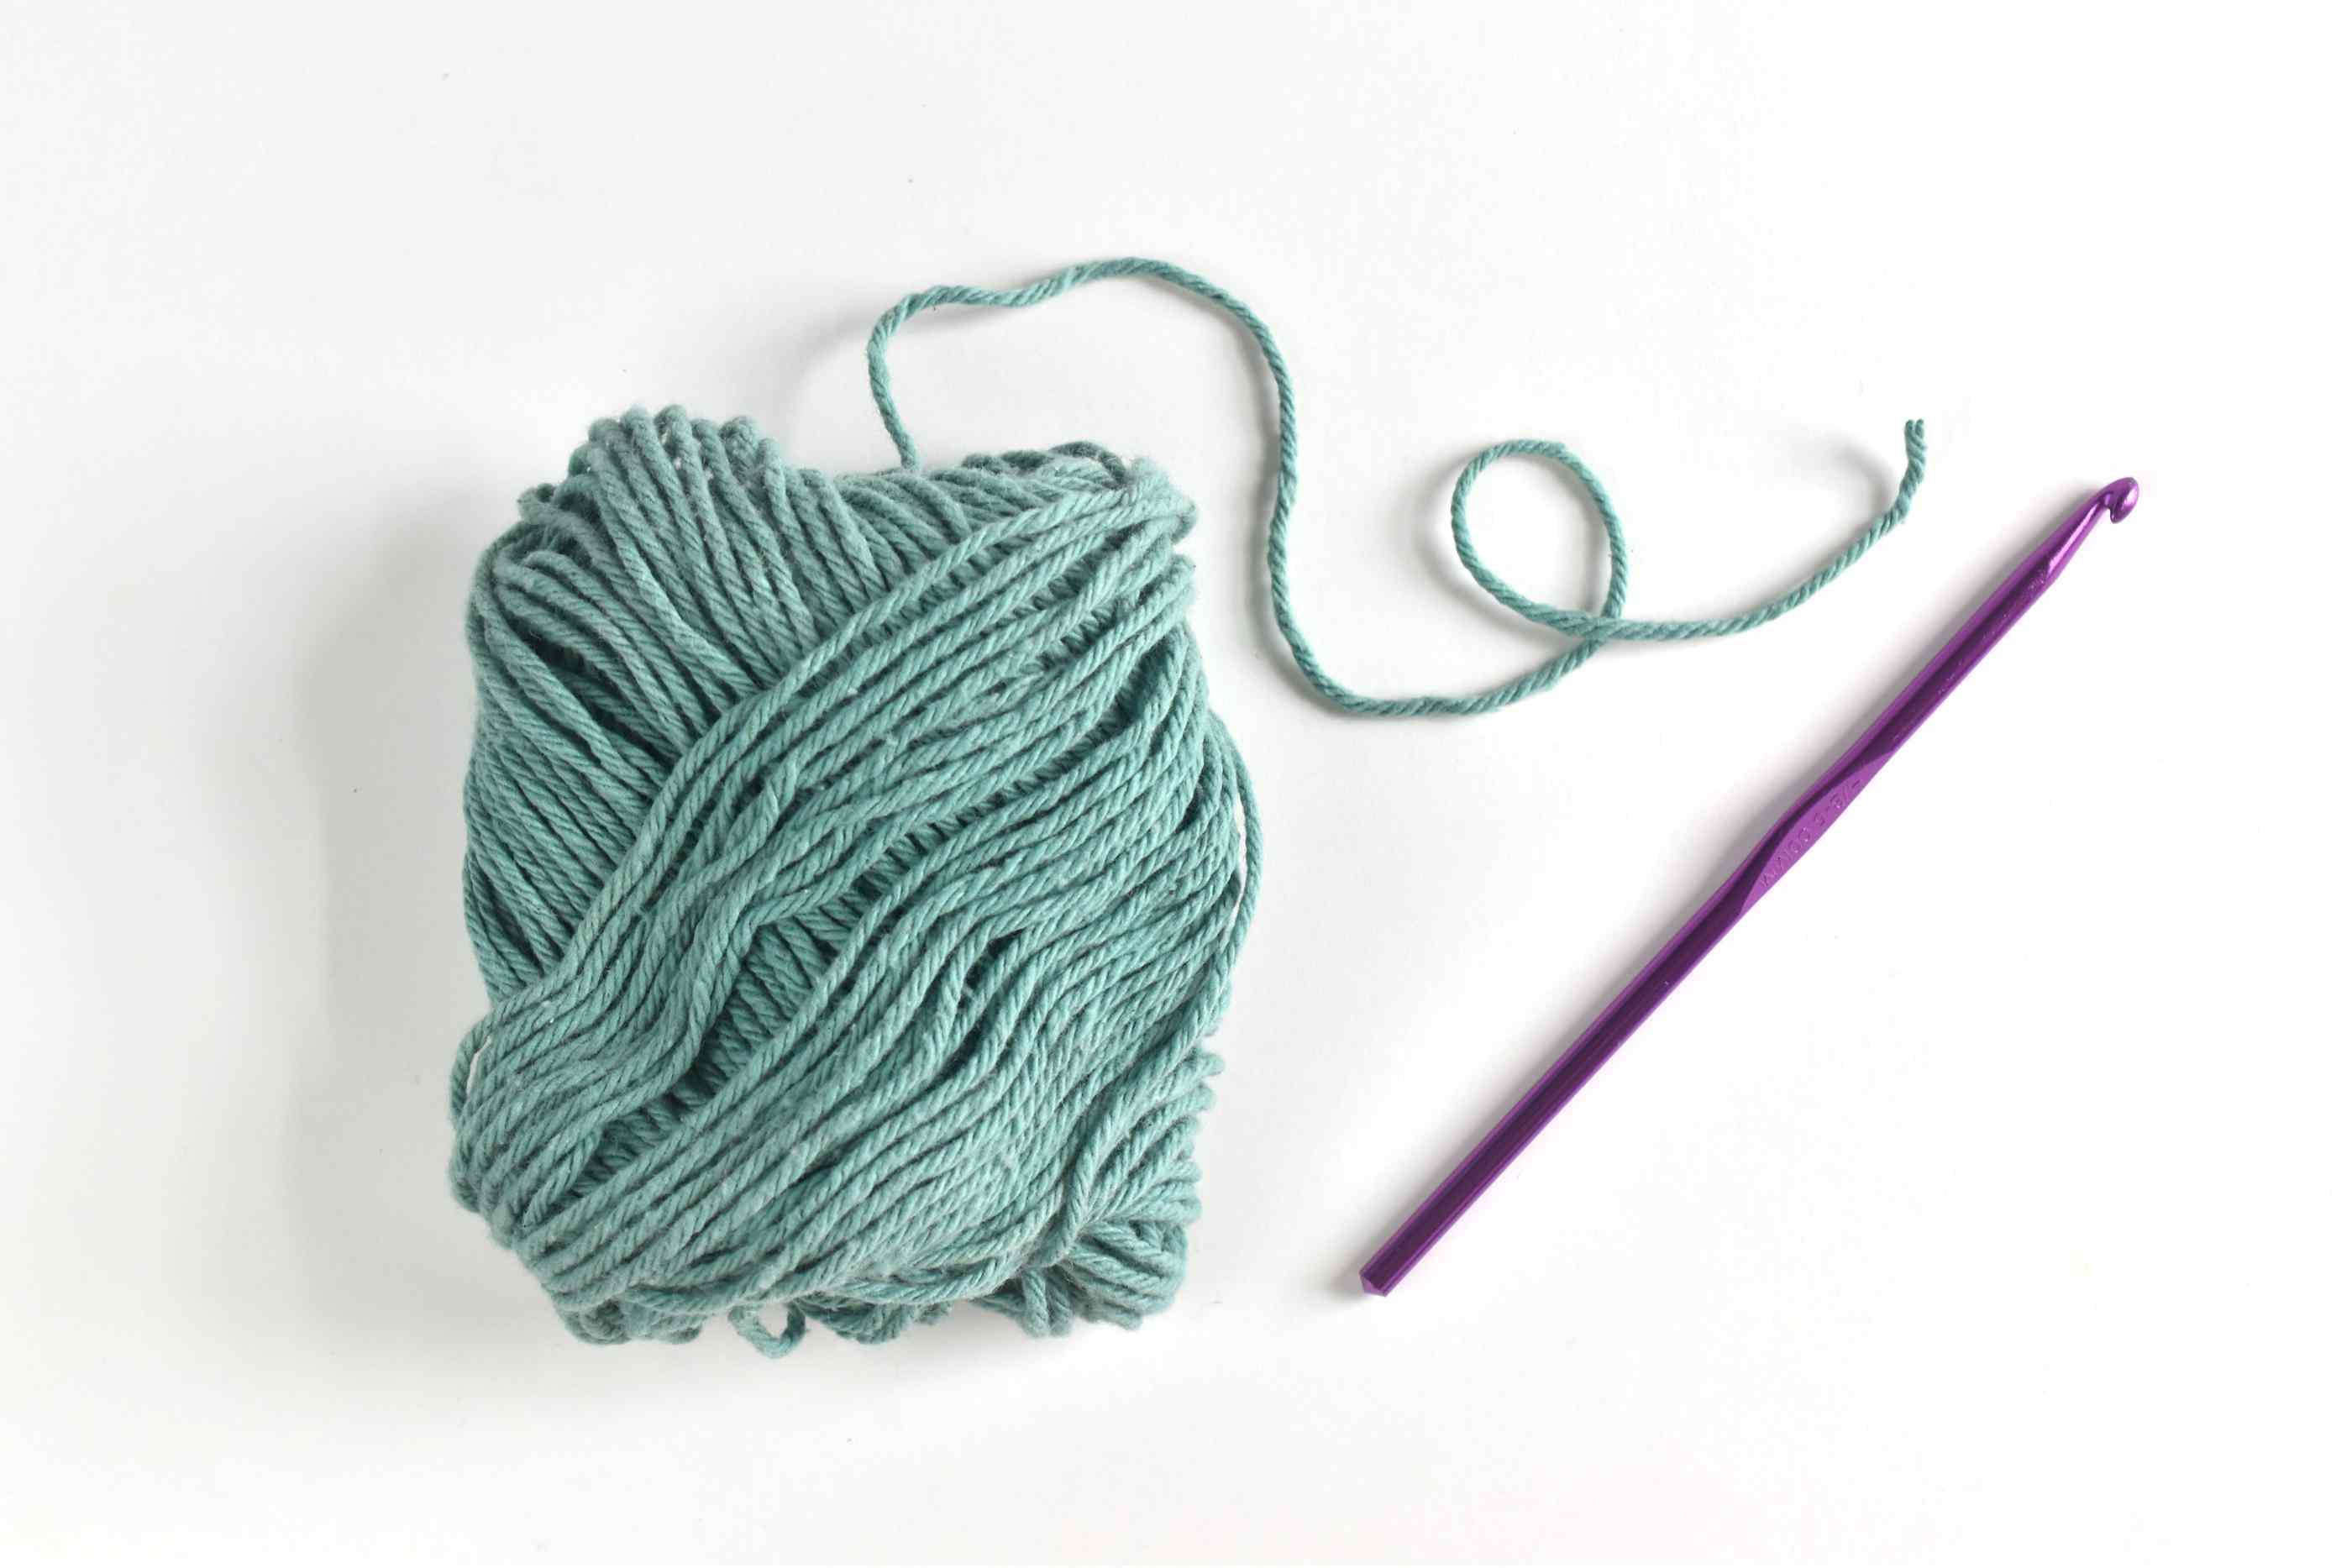 Ball of teal yarn and purple crochet hook.